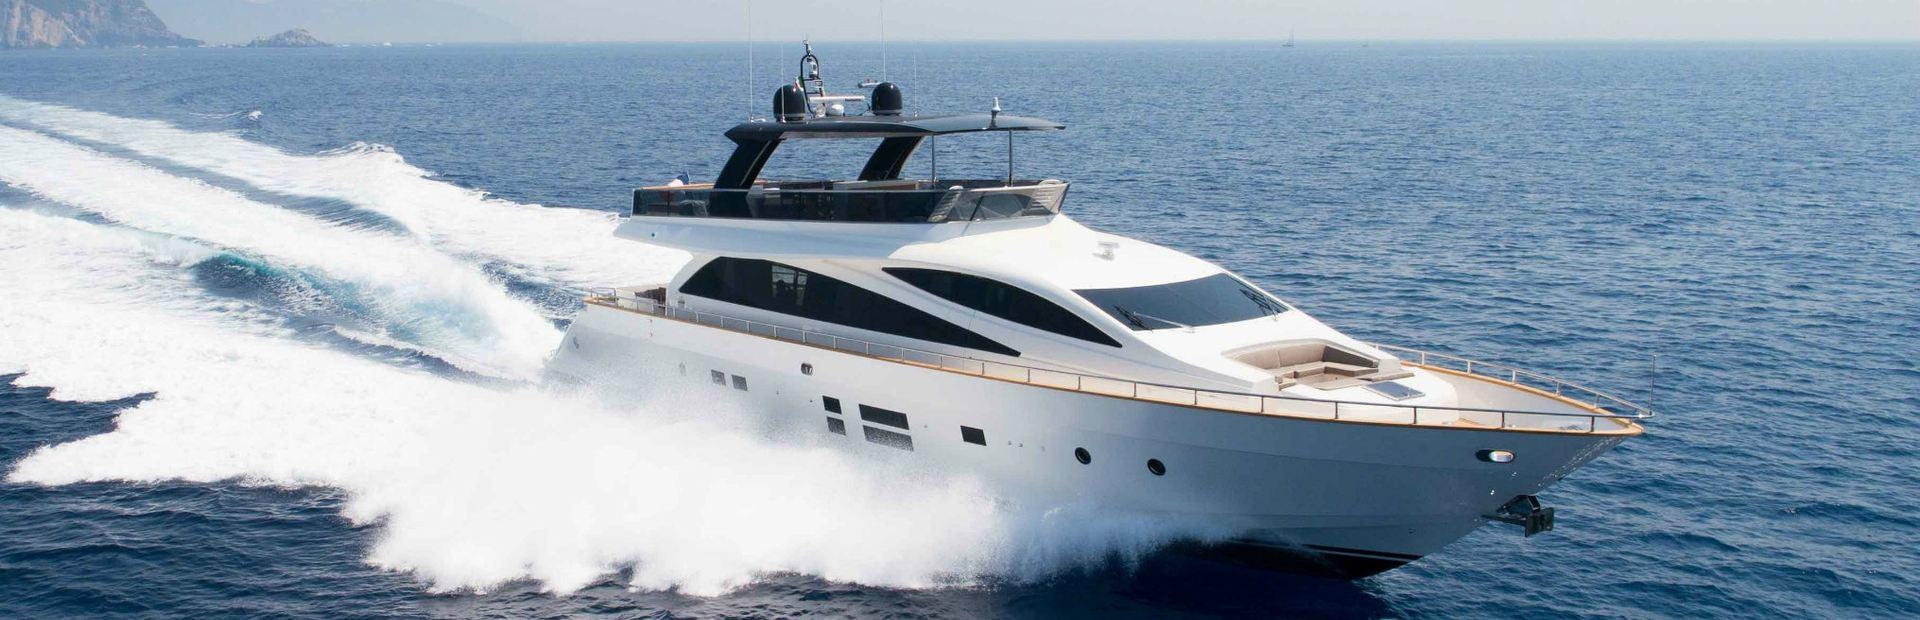 Amer 94 Yacht Charter